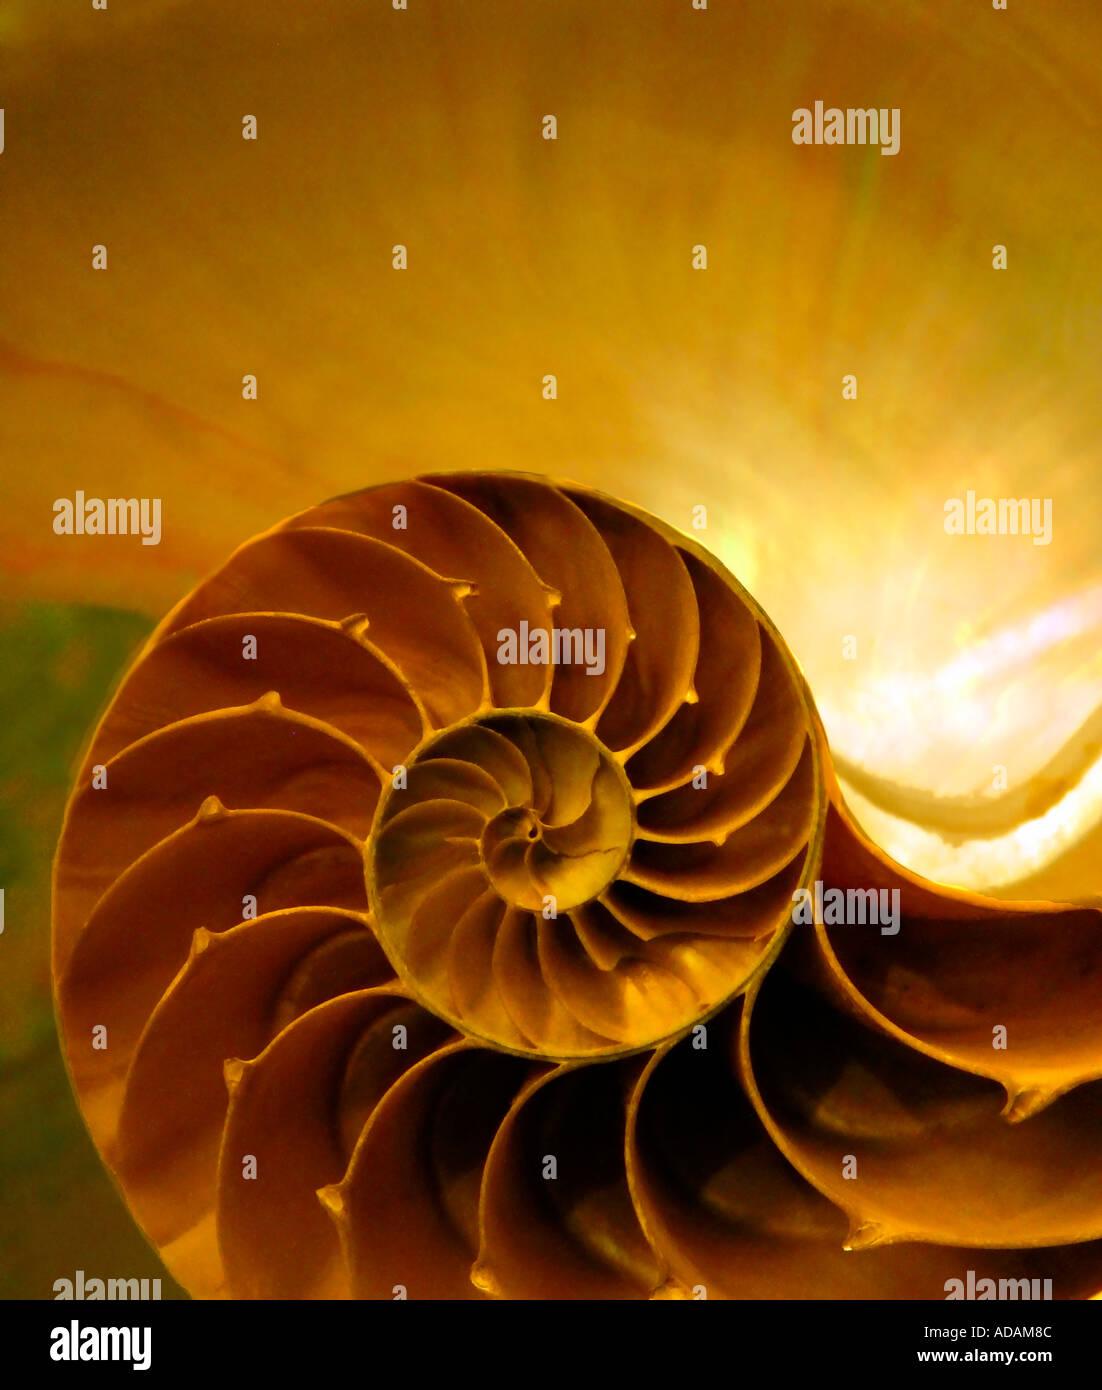 Seashell Shell Spiral Spiraling Stock Photos Seashell Shell Spiral